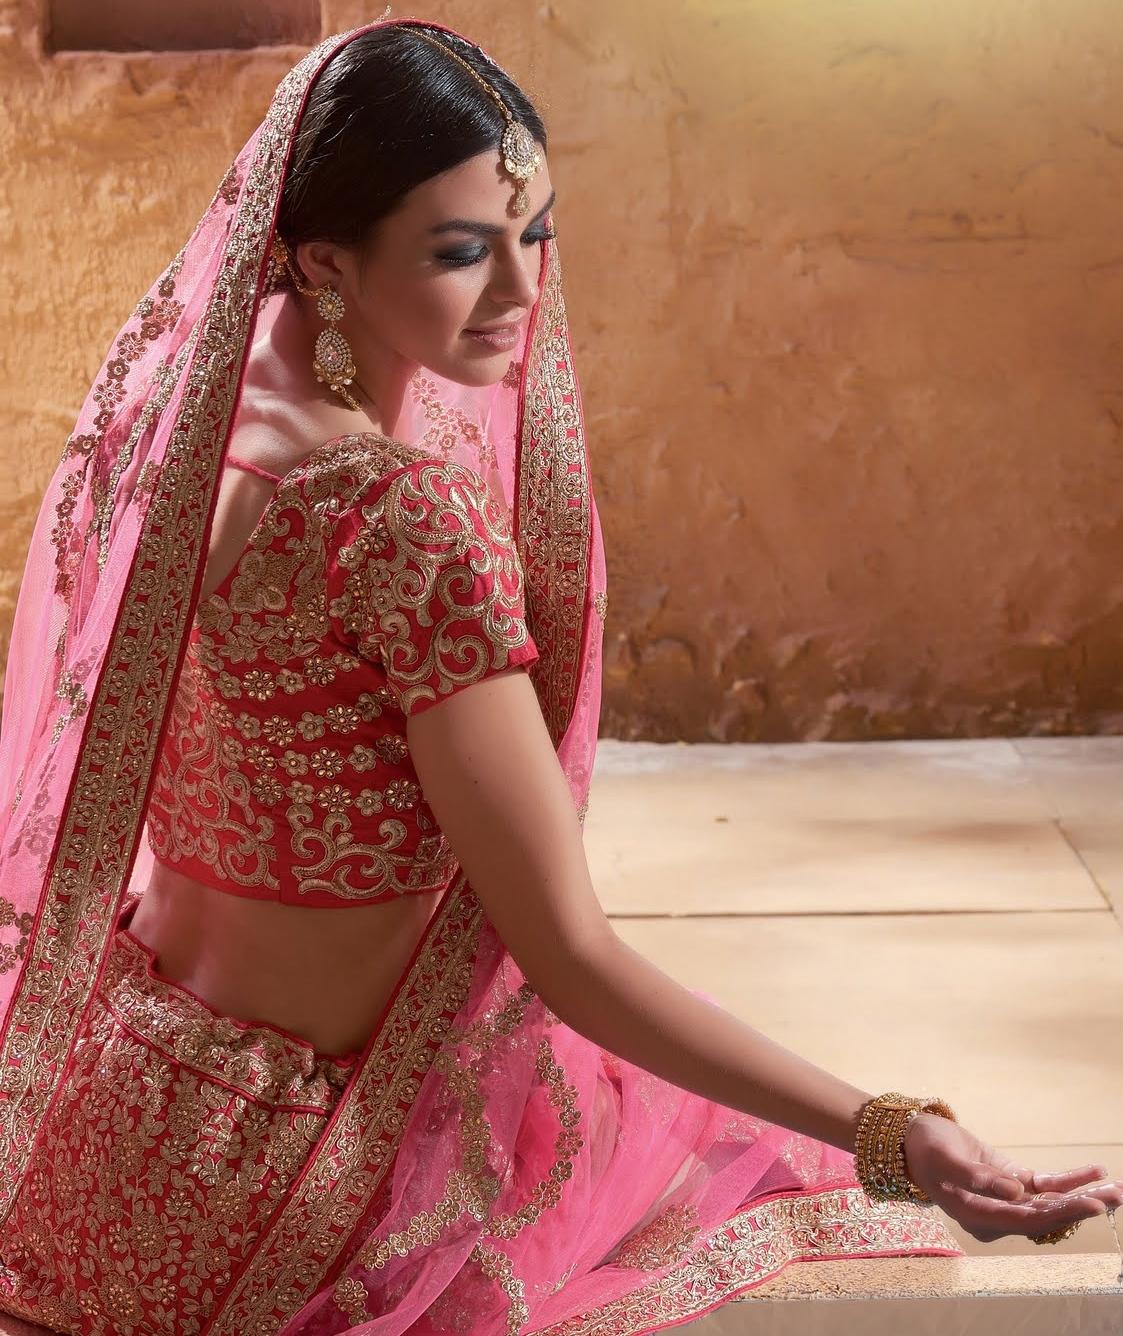 739cc39a2c Buy Light pink color raw silk bridal lehenga choli in UK, USA and Canada